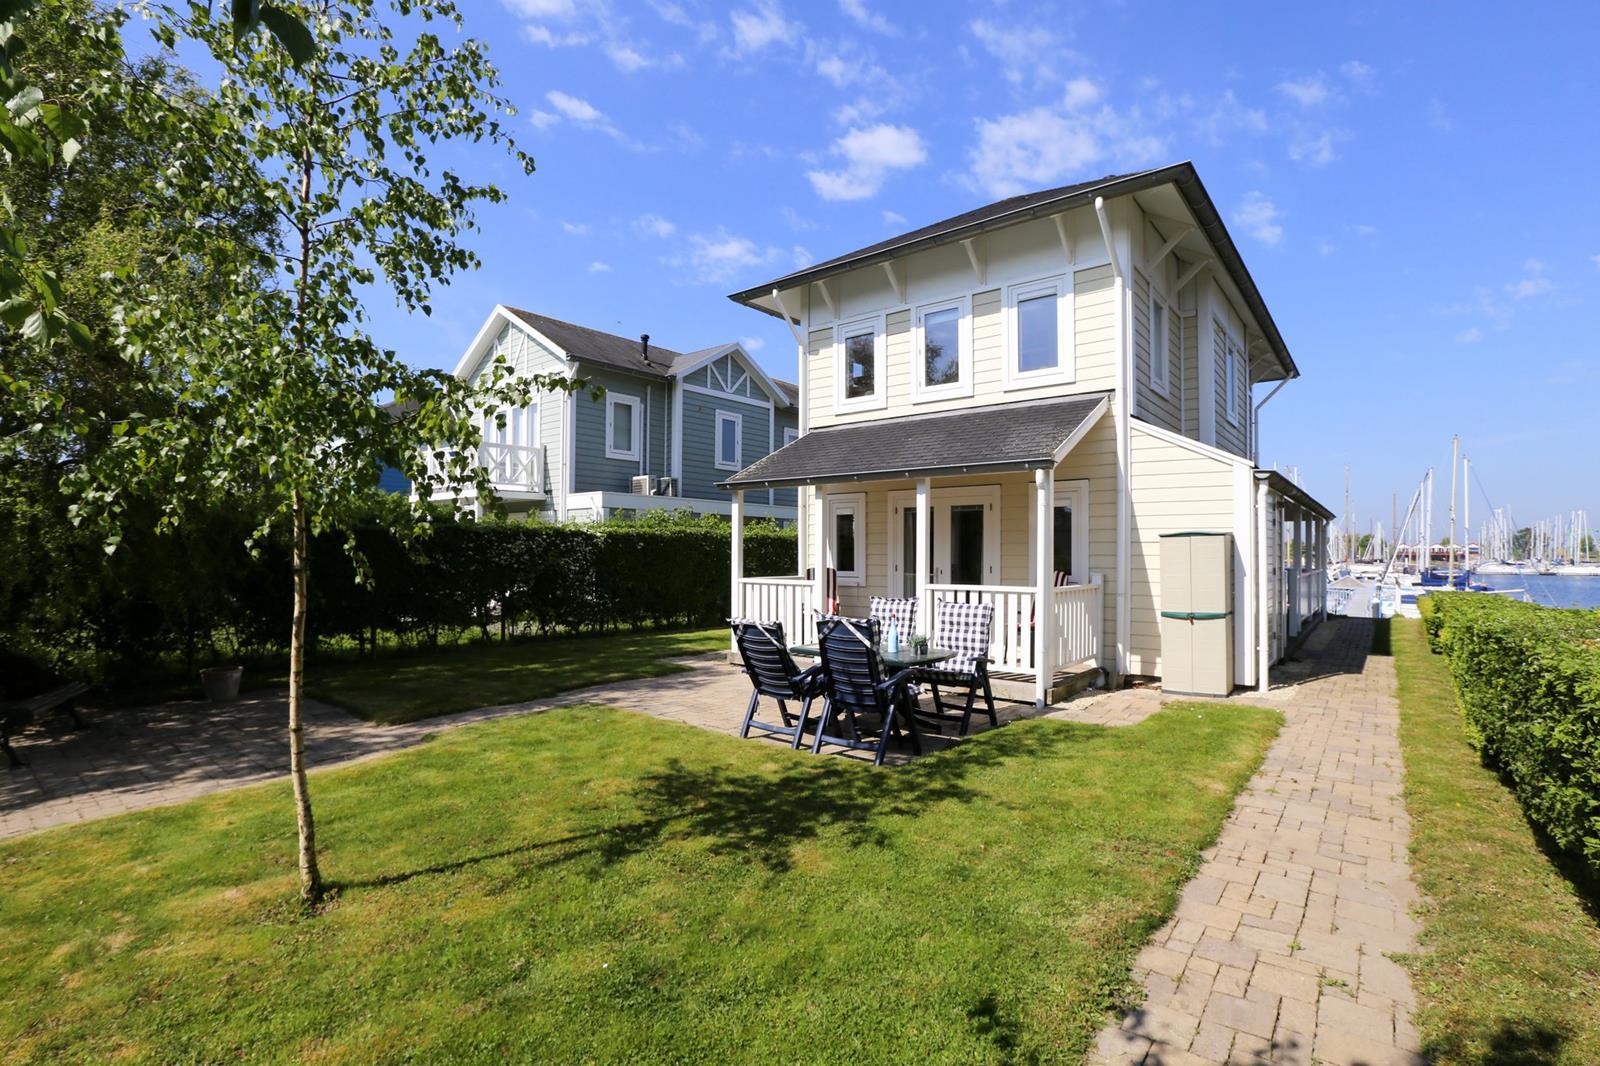 Vakantiehuis te koop aan water in Zuid-Holland 002.jpg